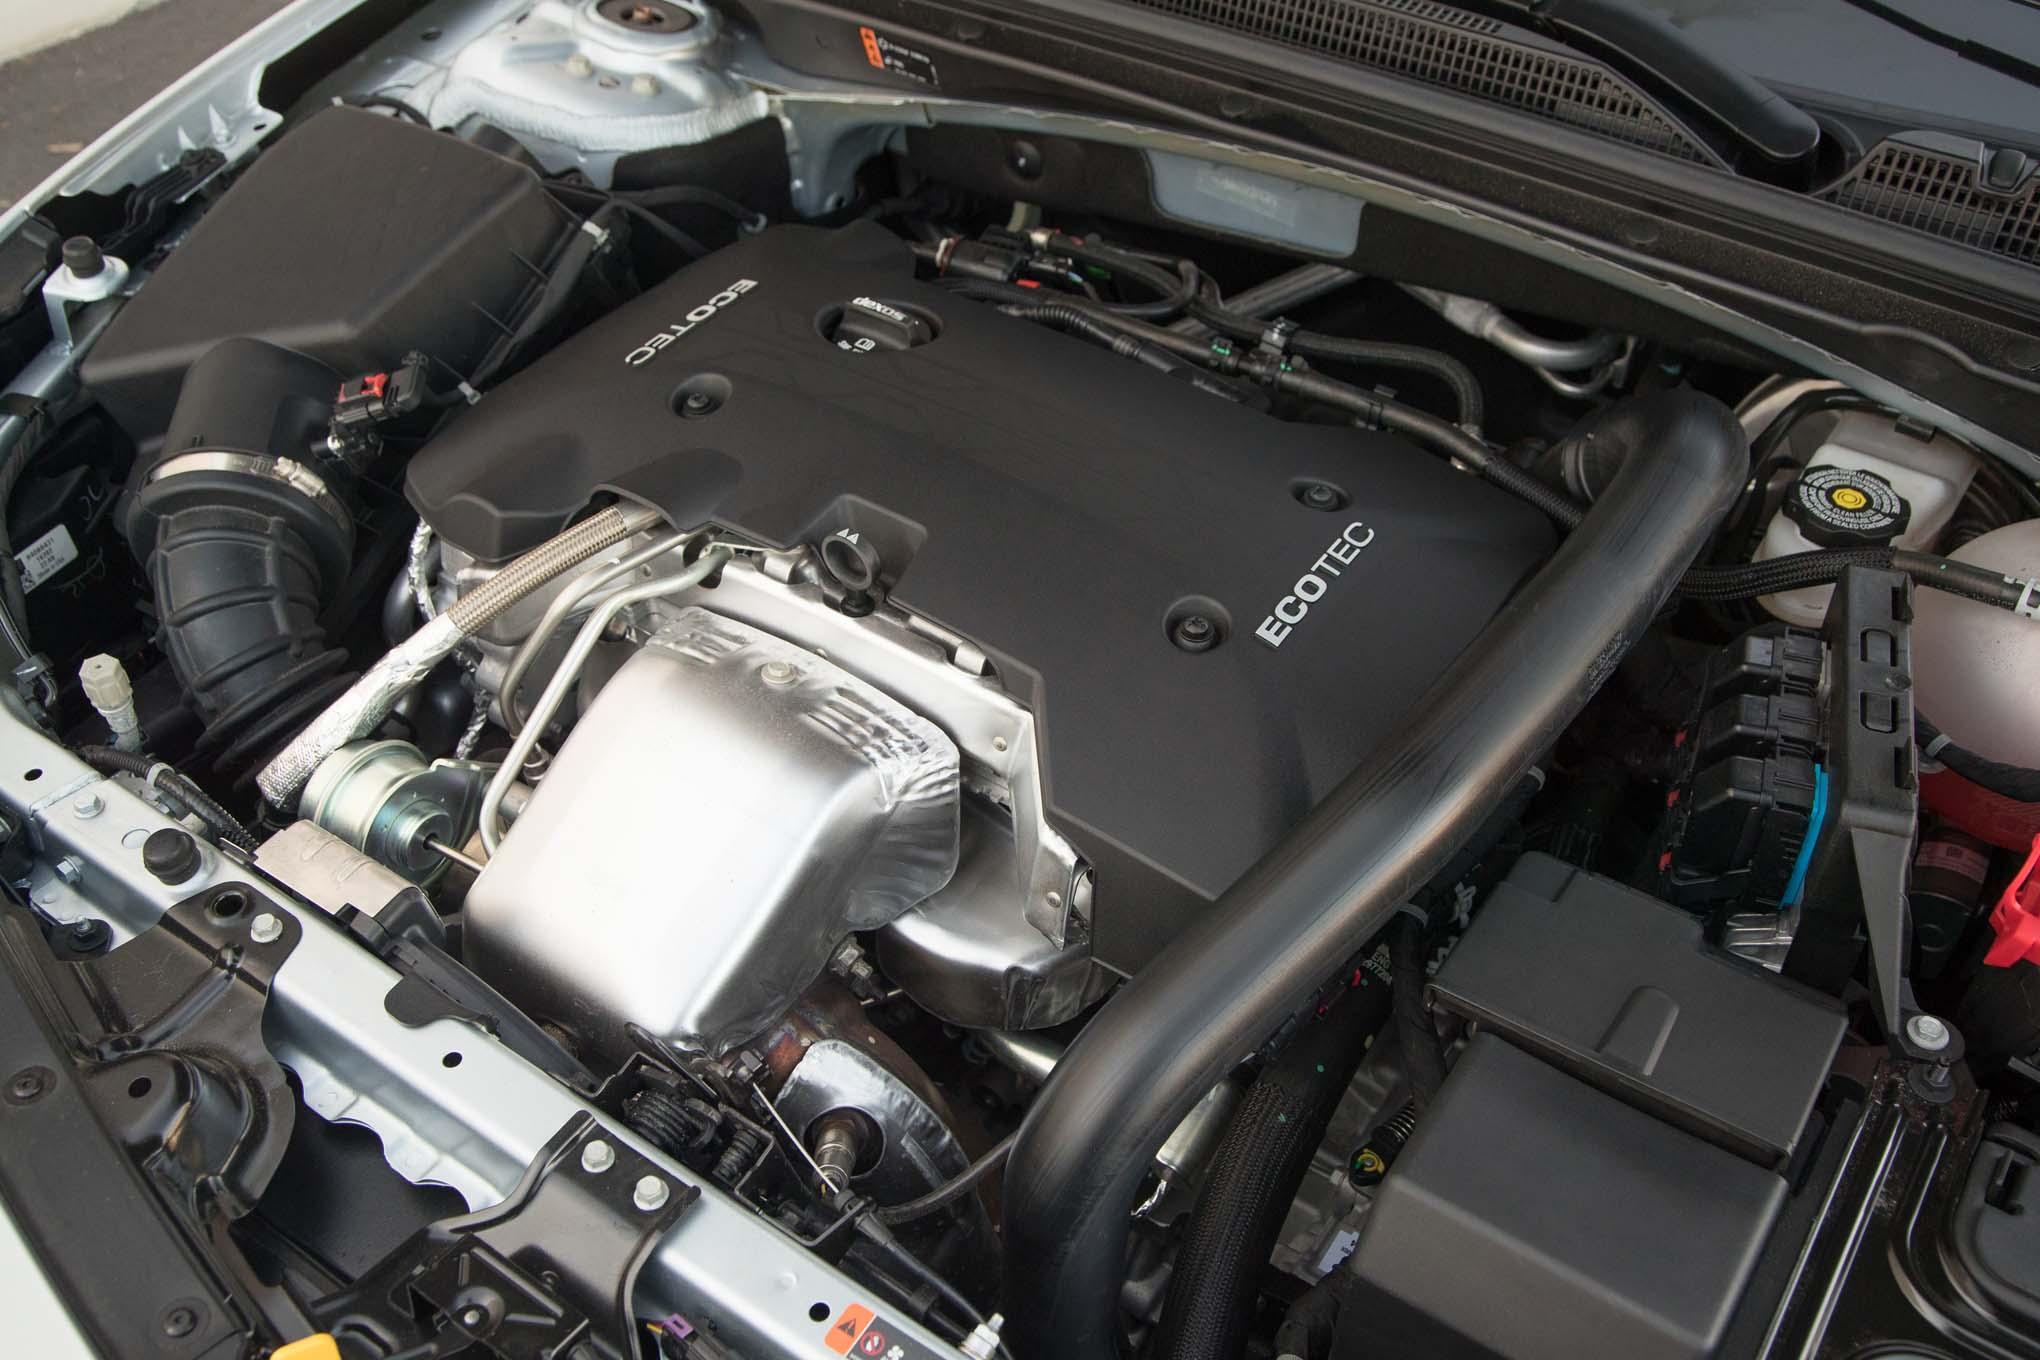 2017 Chevrolet Malibu 20T Premier engine - Motor Trend en ...